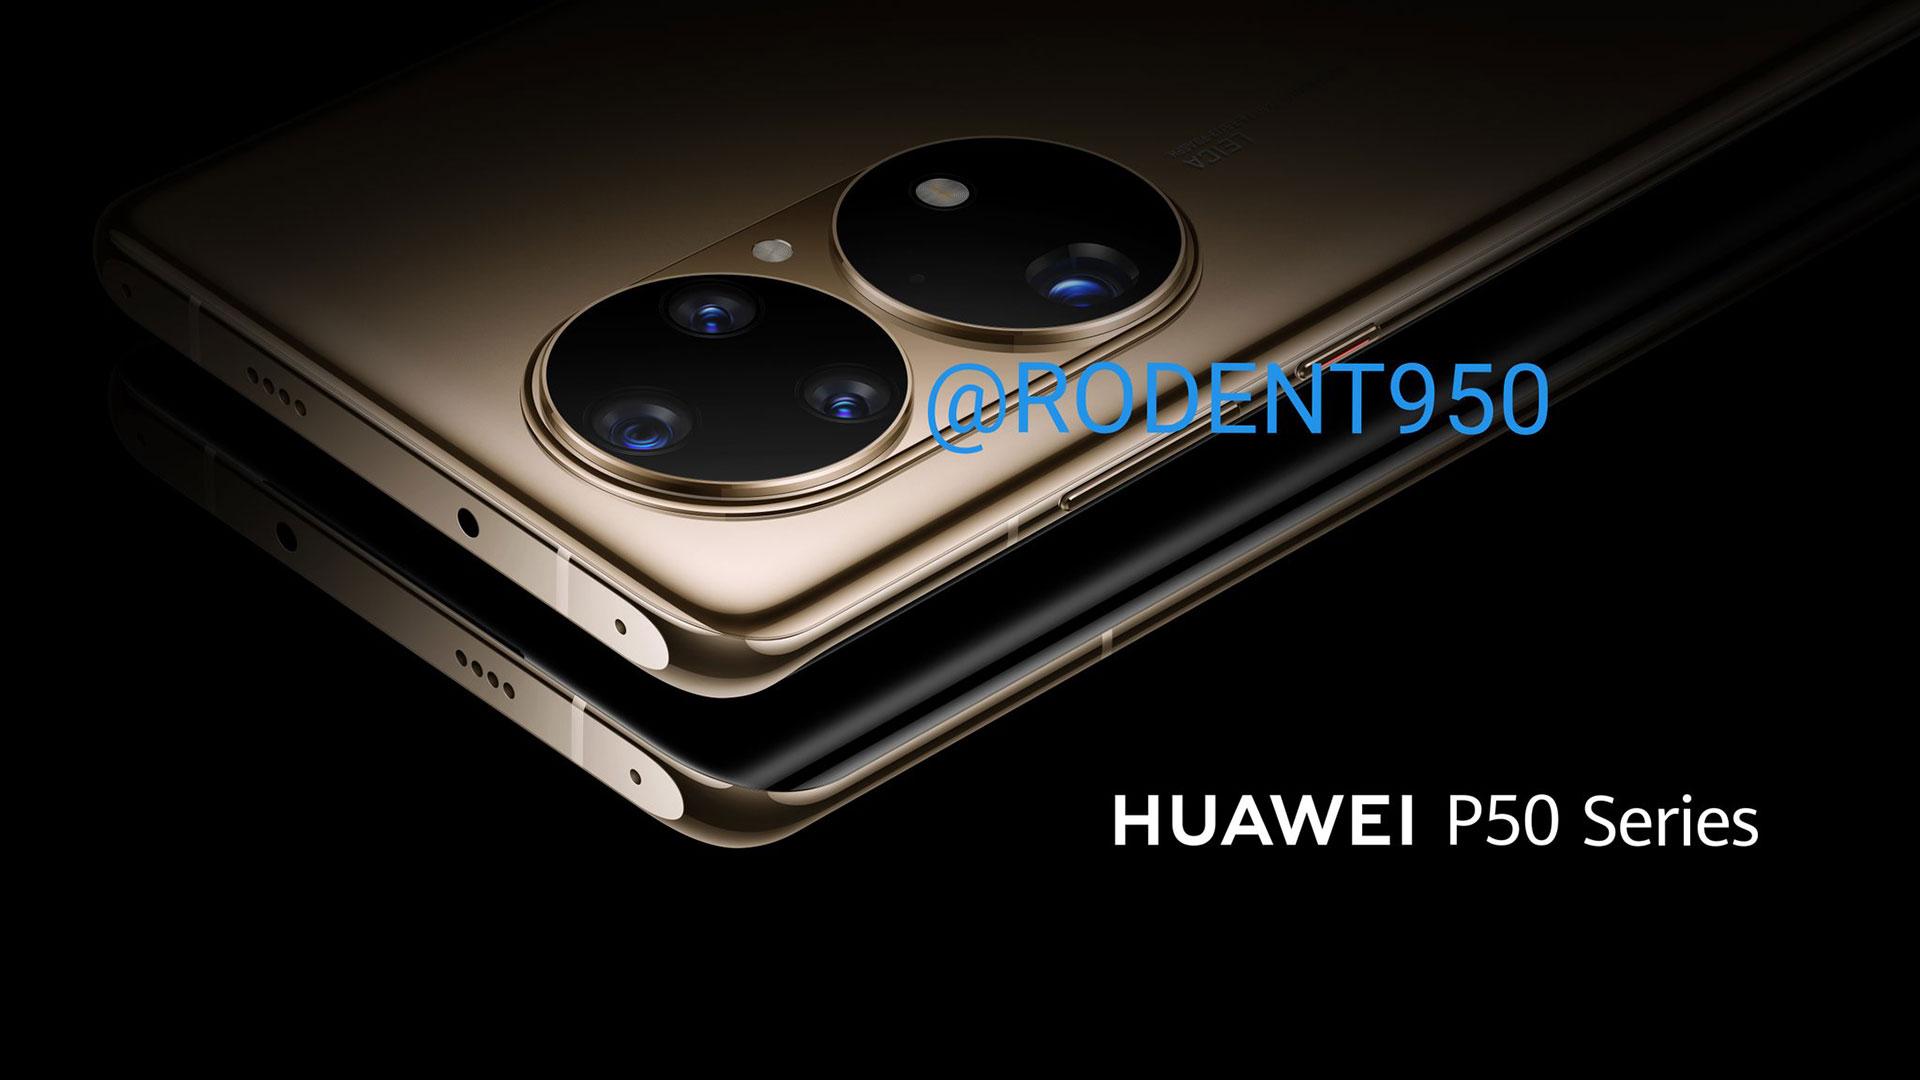 huawei p50 camera leak